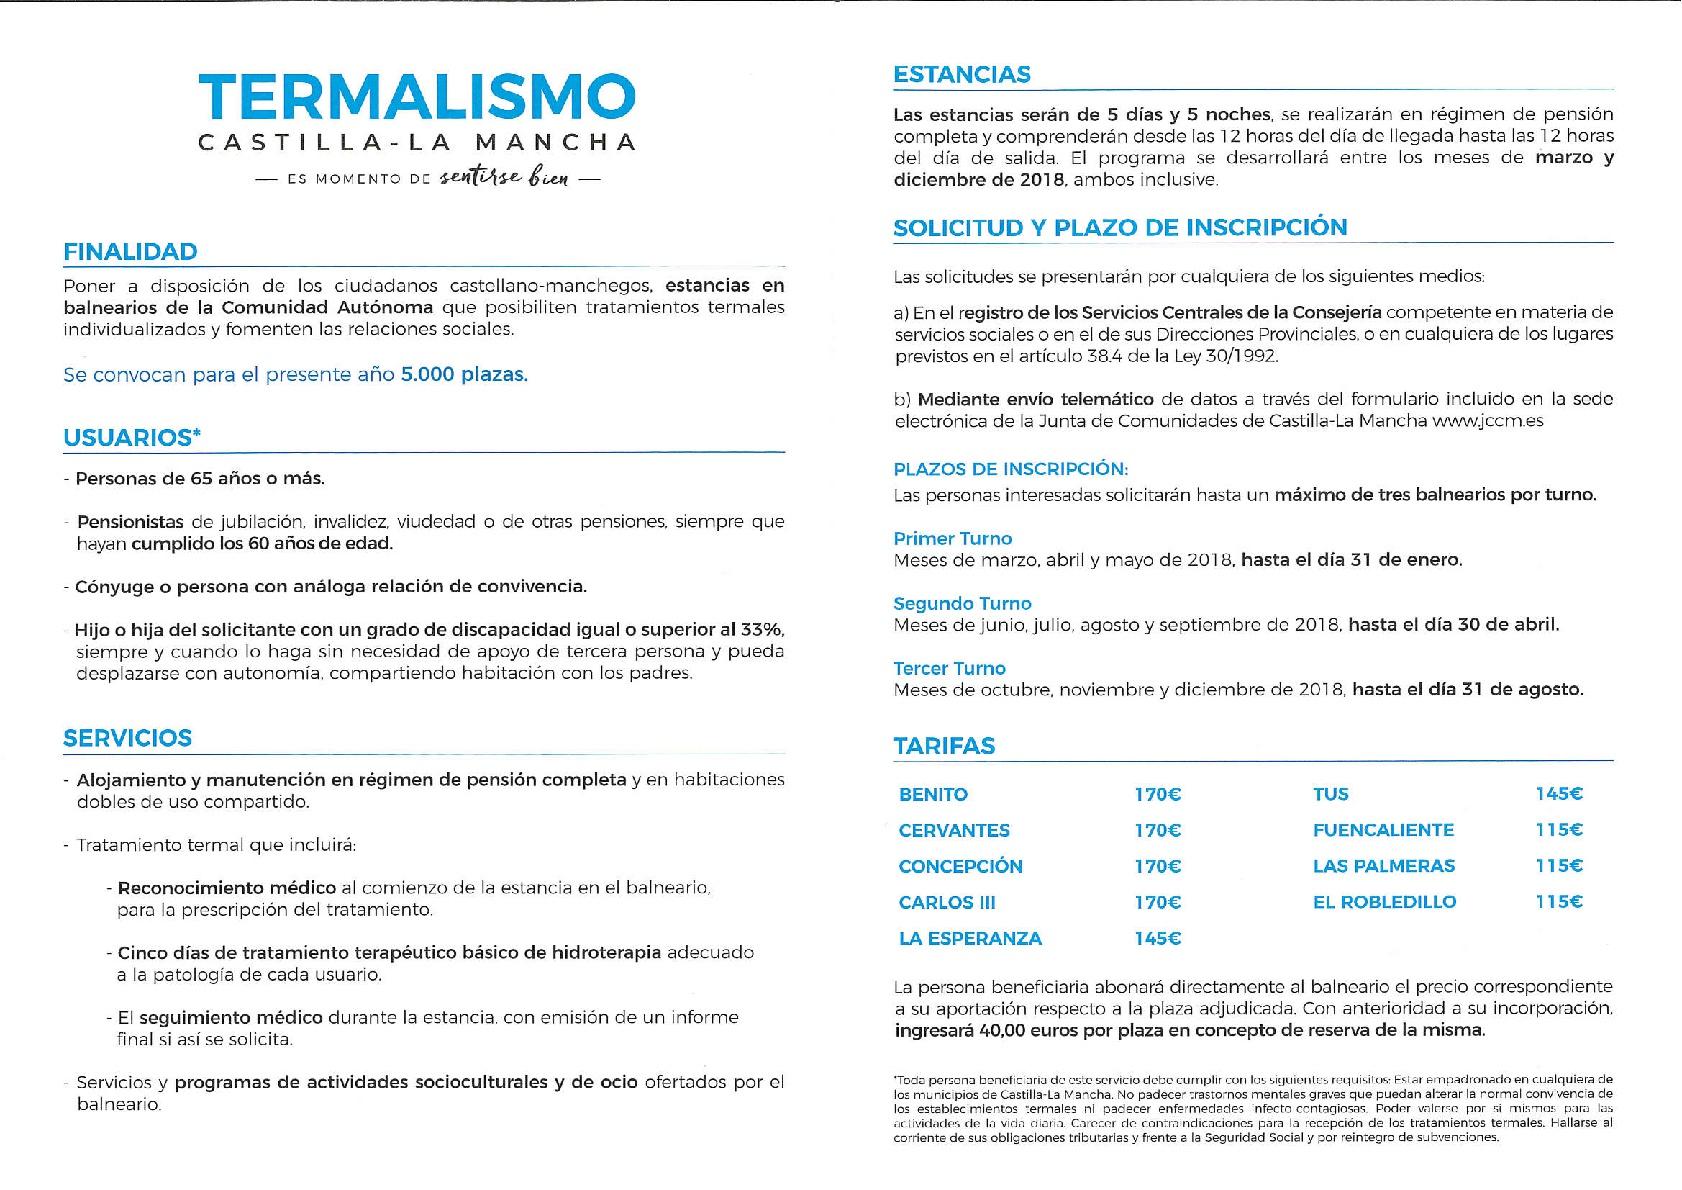 TERMALISMO-CASTILLA-LA-MANCHA-001